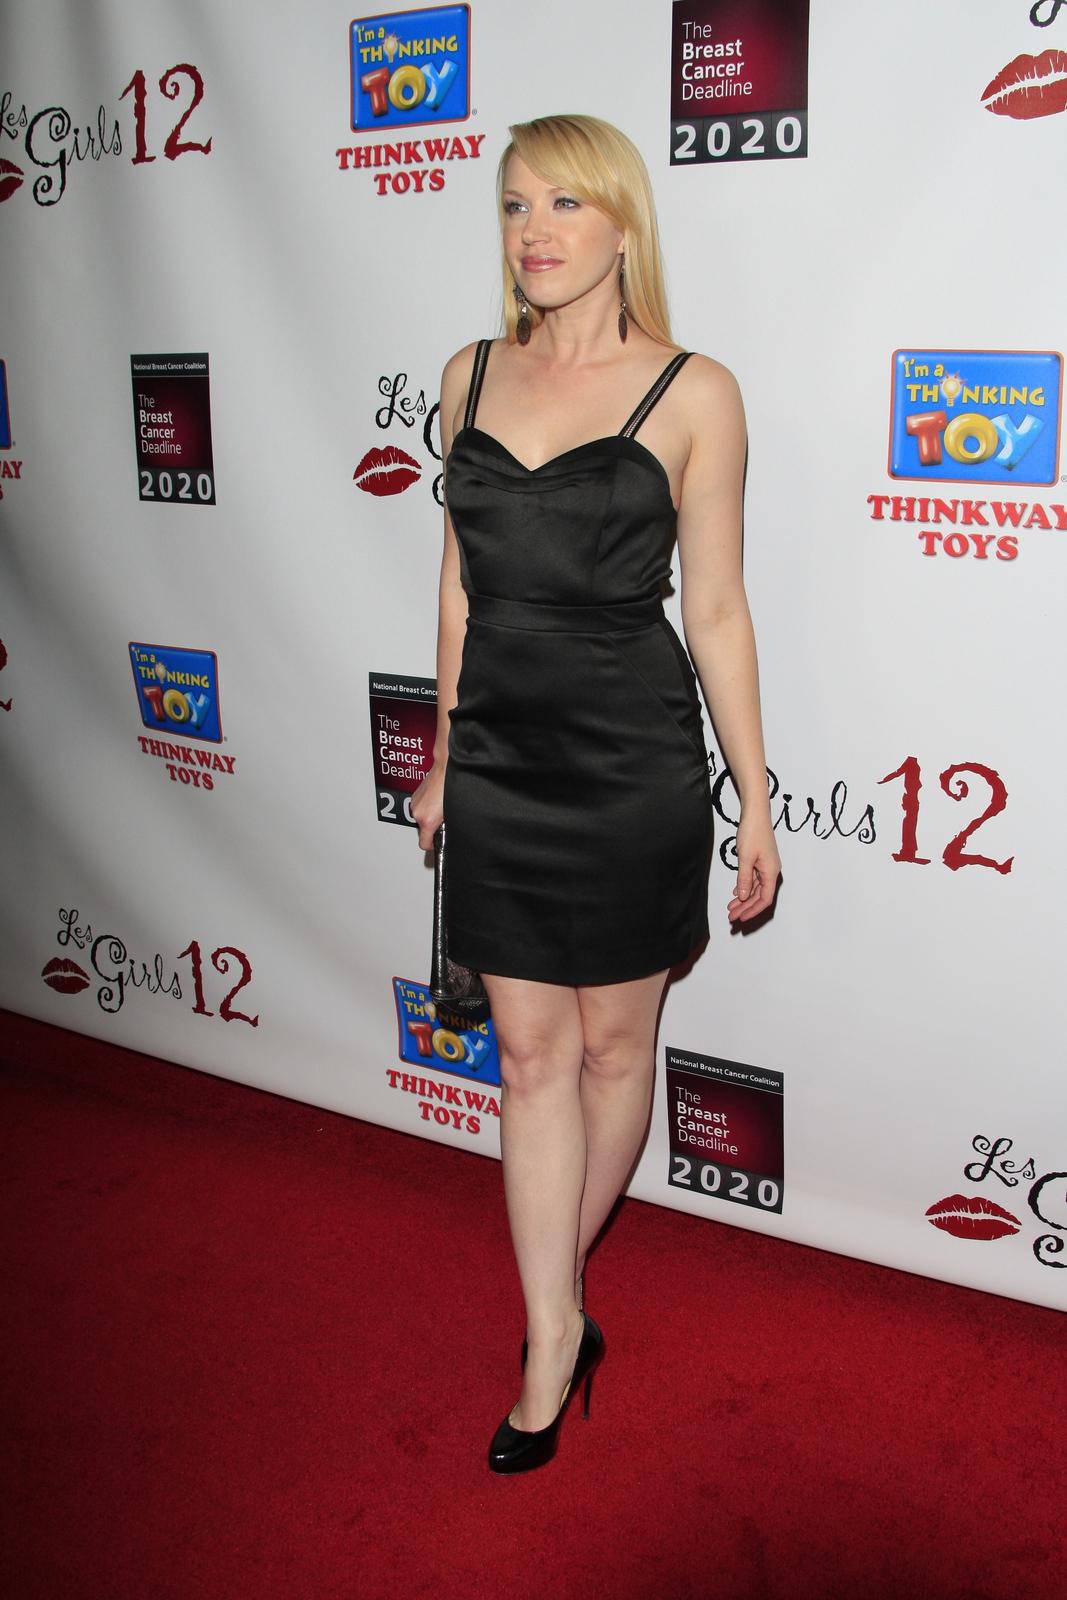 Samantha Fox,Jacqueline Kim Hot pics Paul McGillion,Tre Armstrong